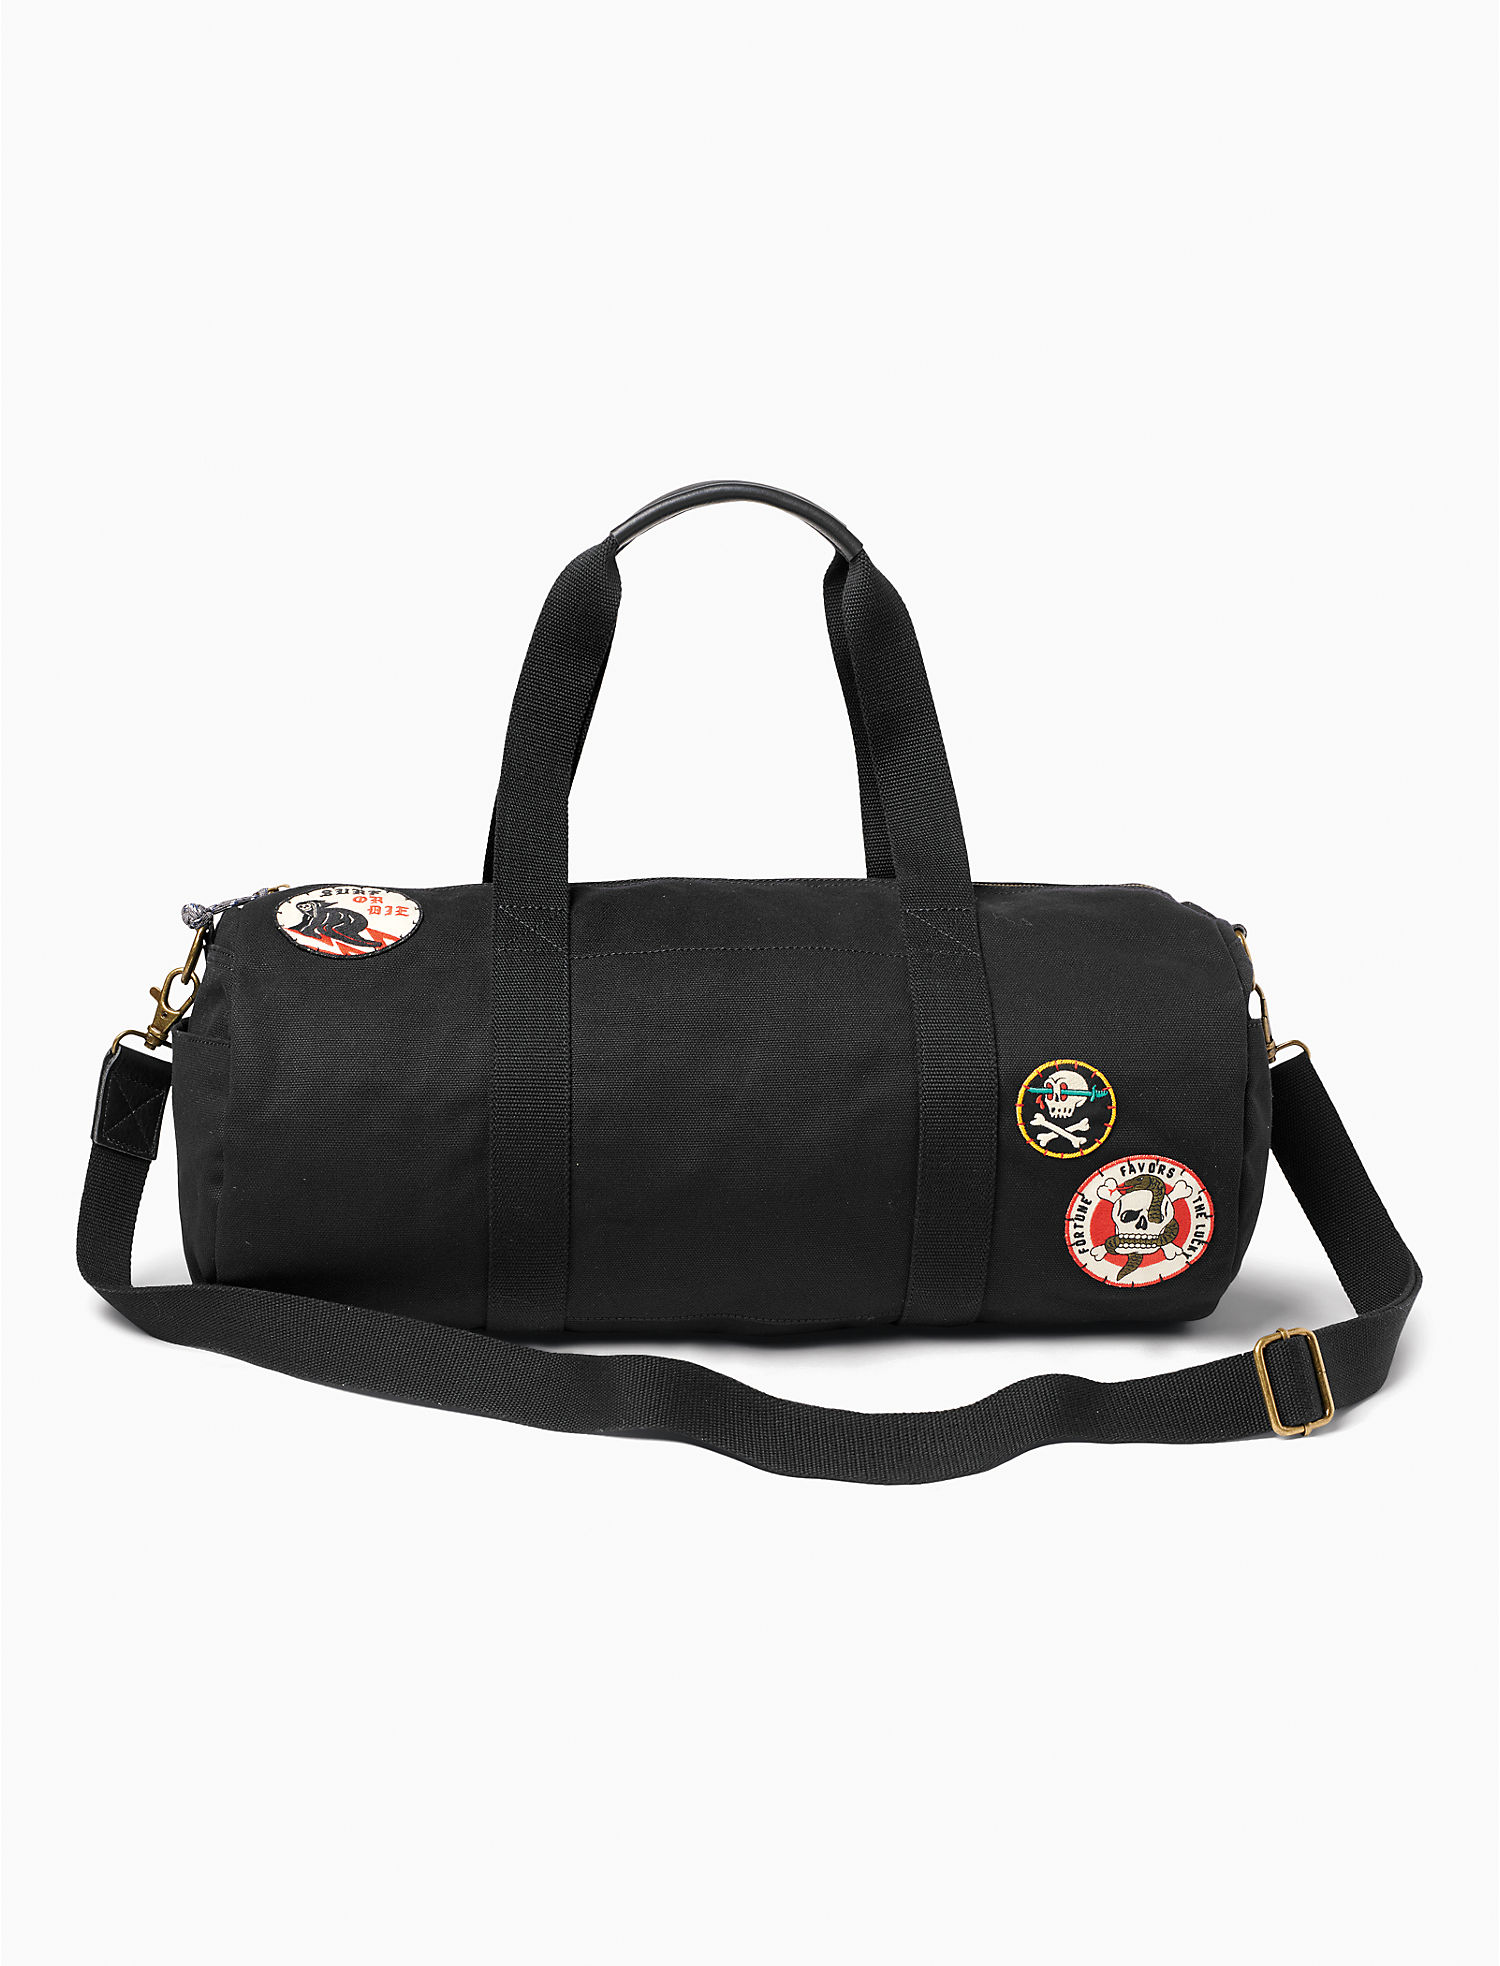 Patch Men S Duffle Bag